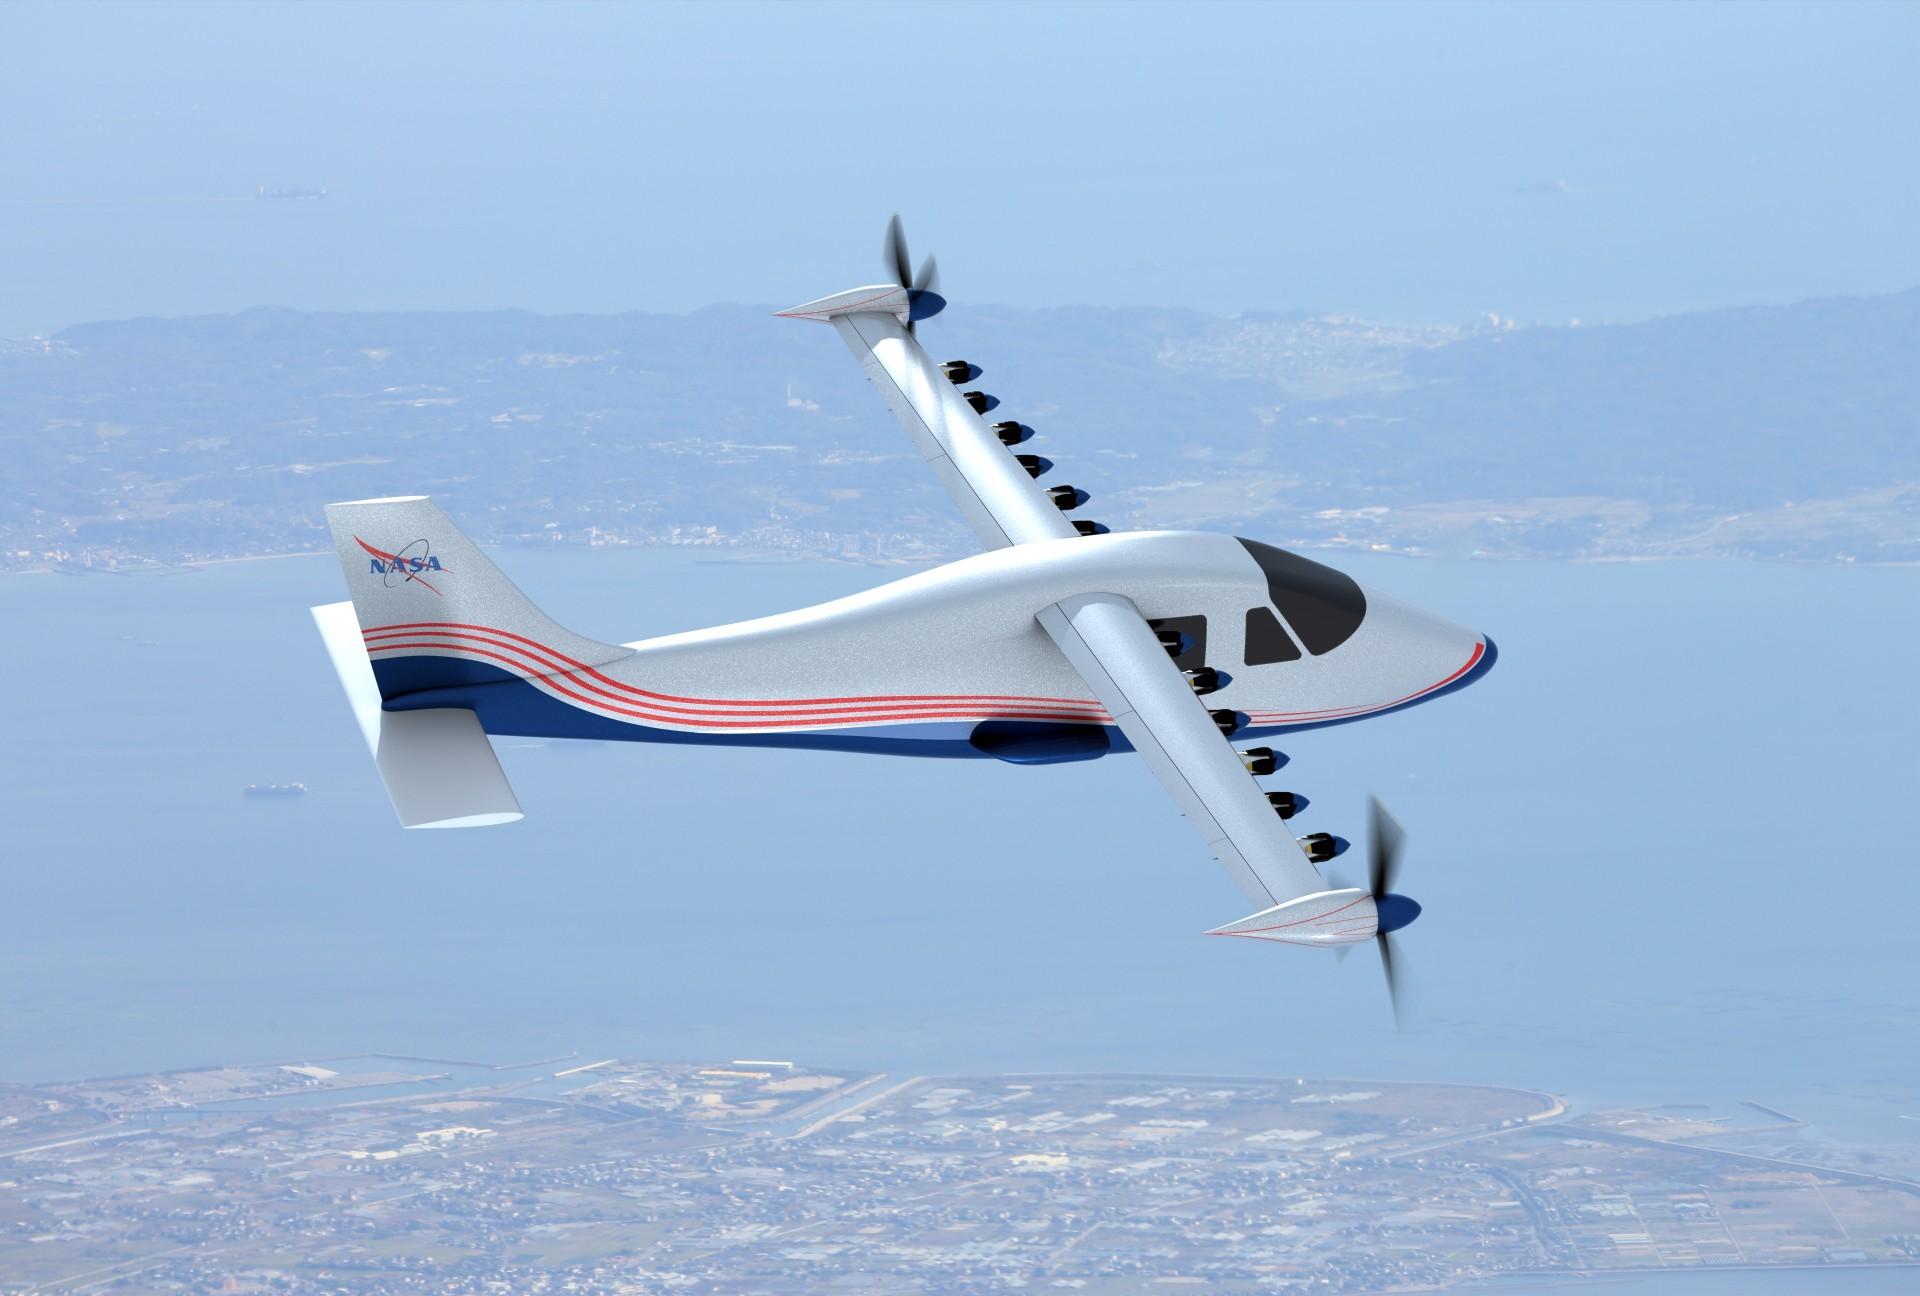 НАСА анонсировало электрический самолёт X-57 Maxwell - 7